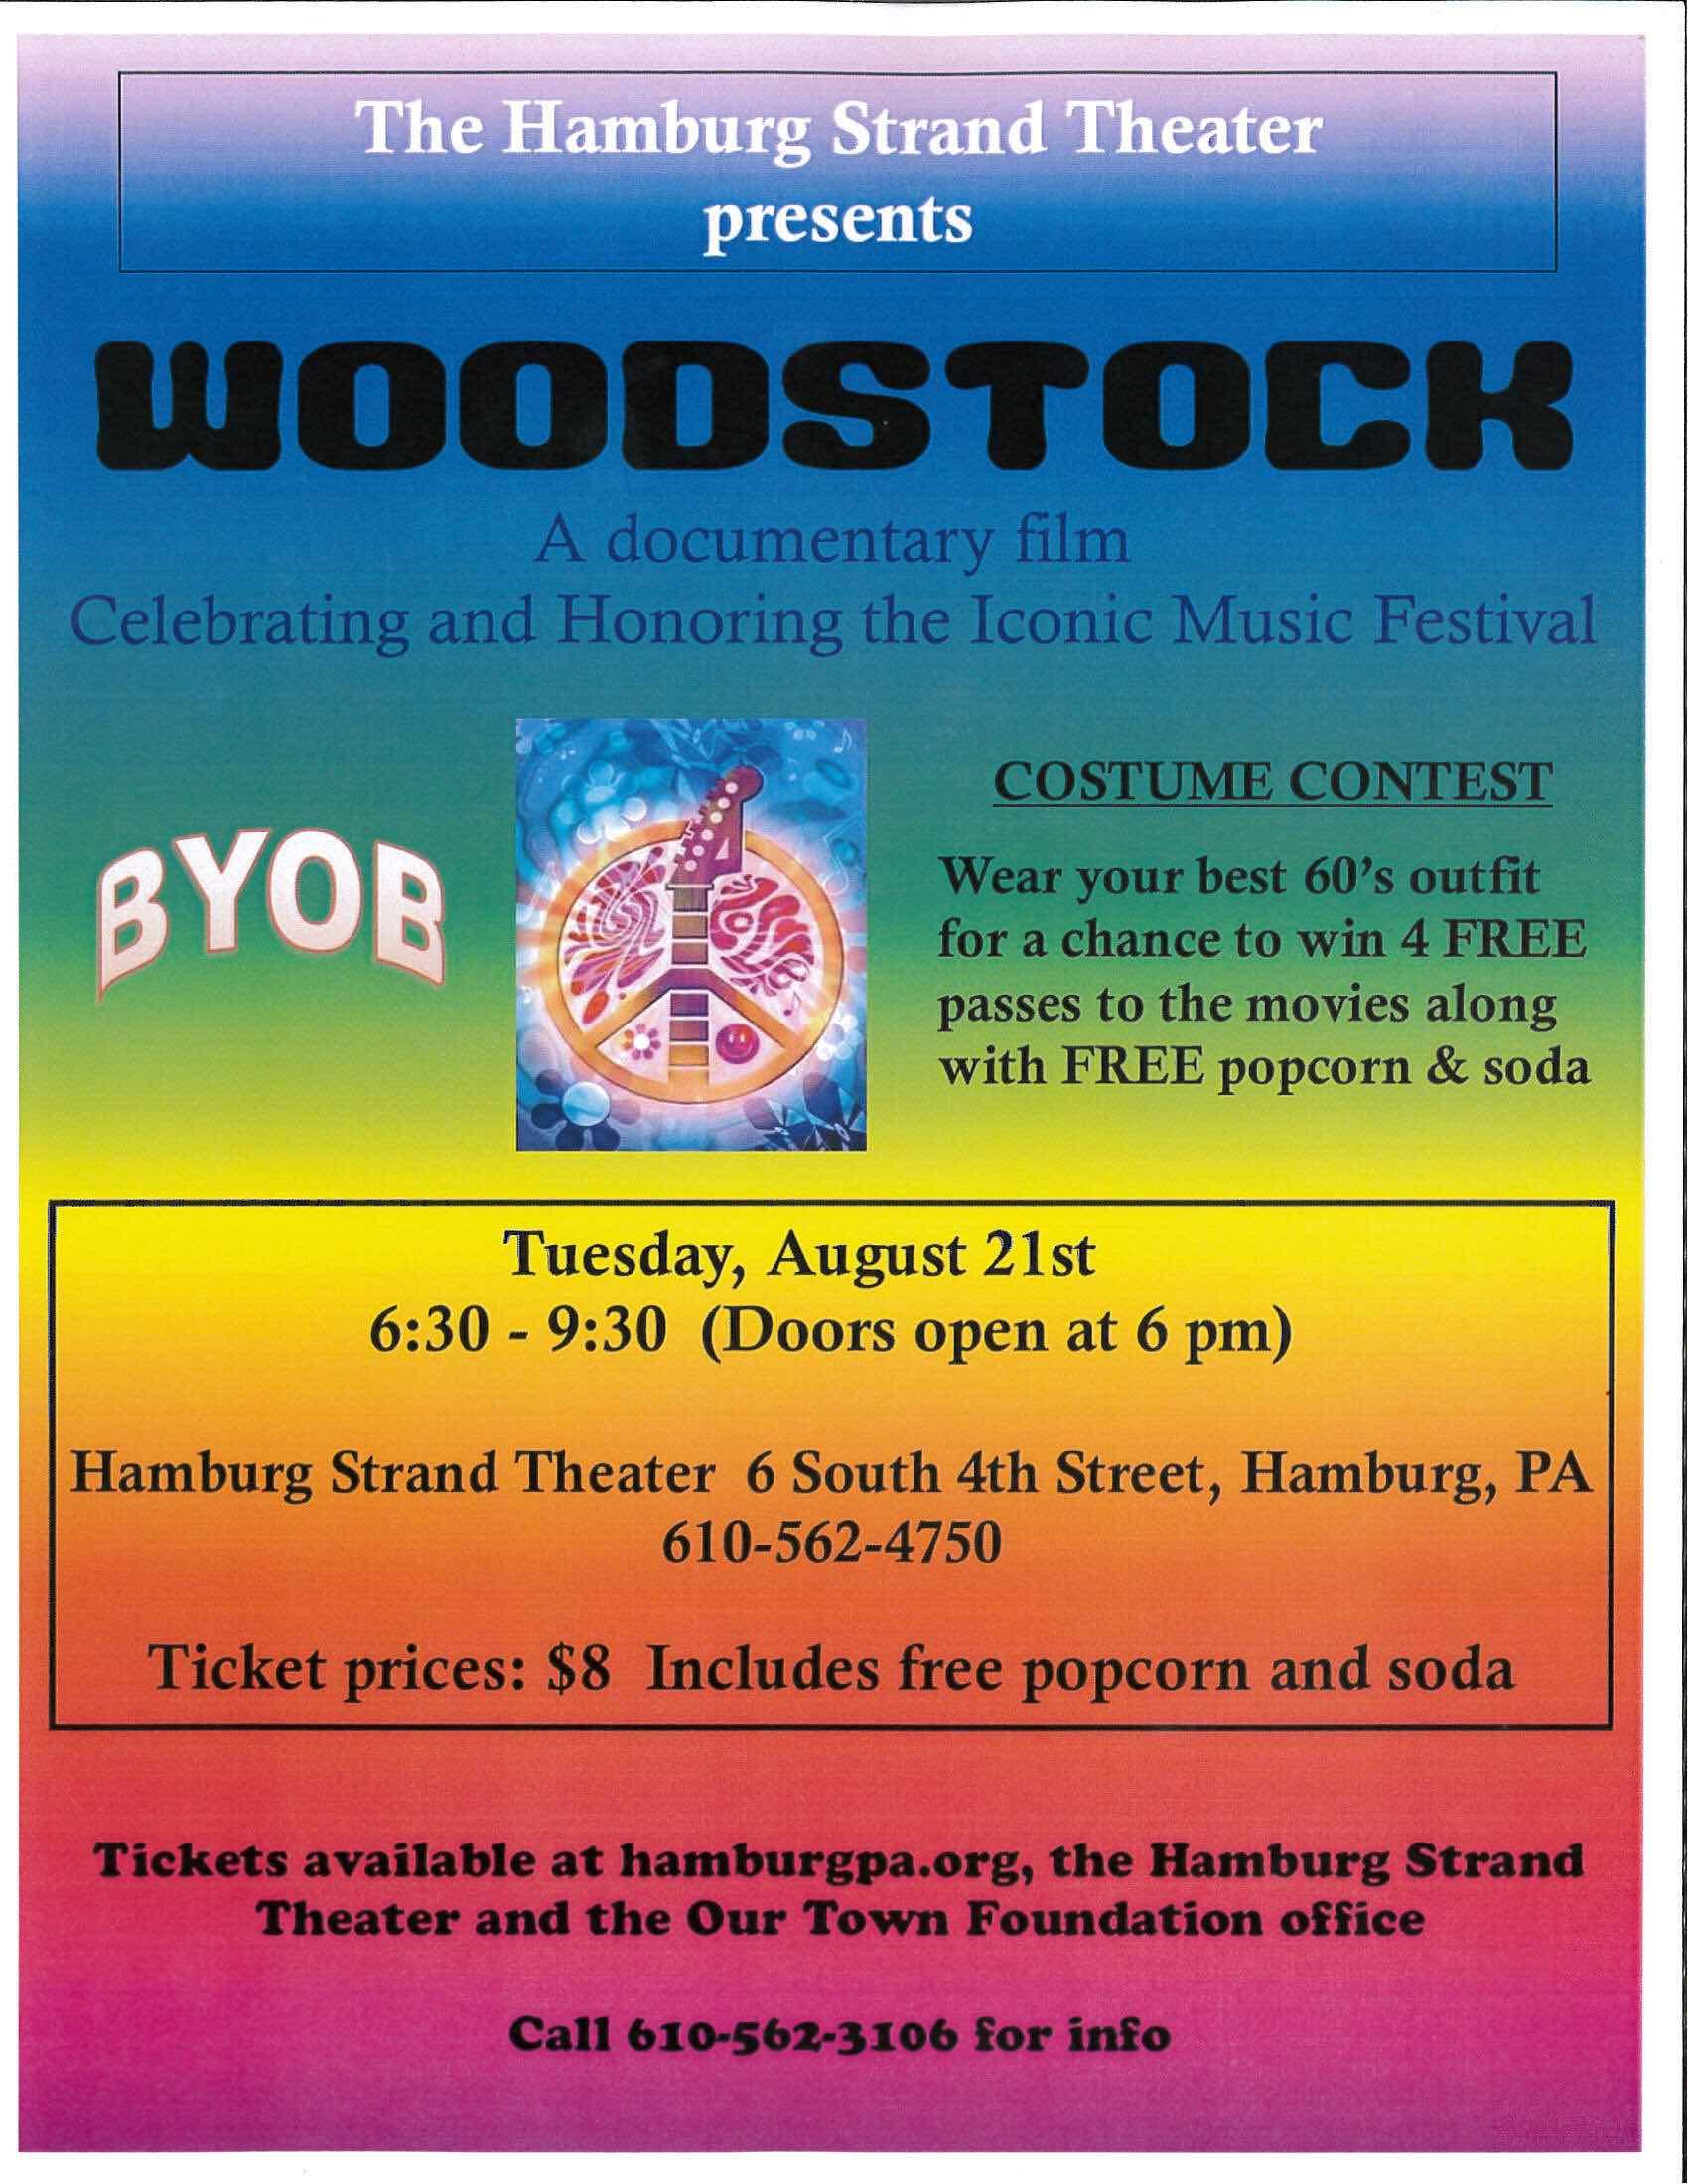 Woodstock_image